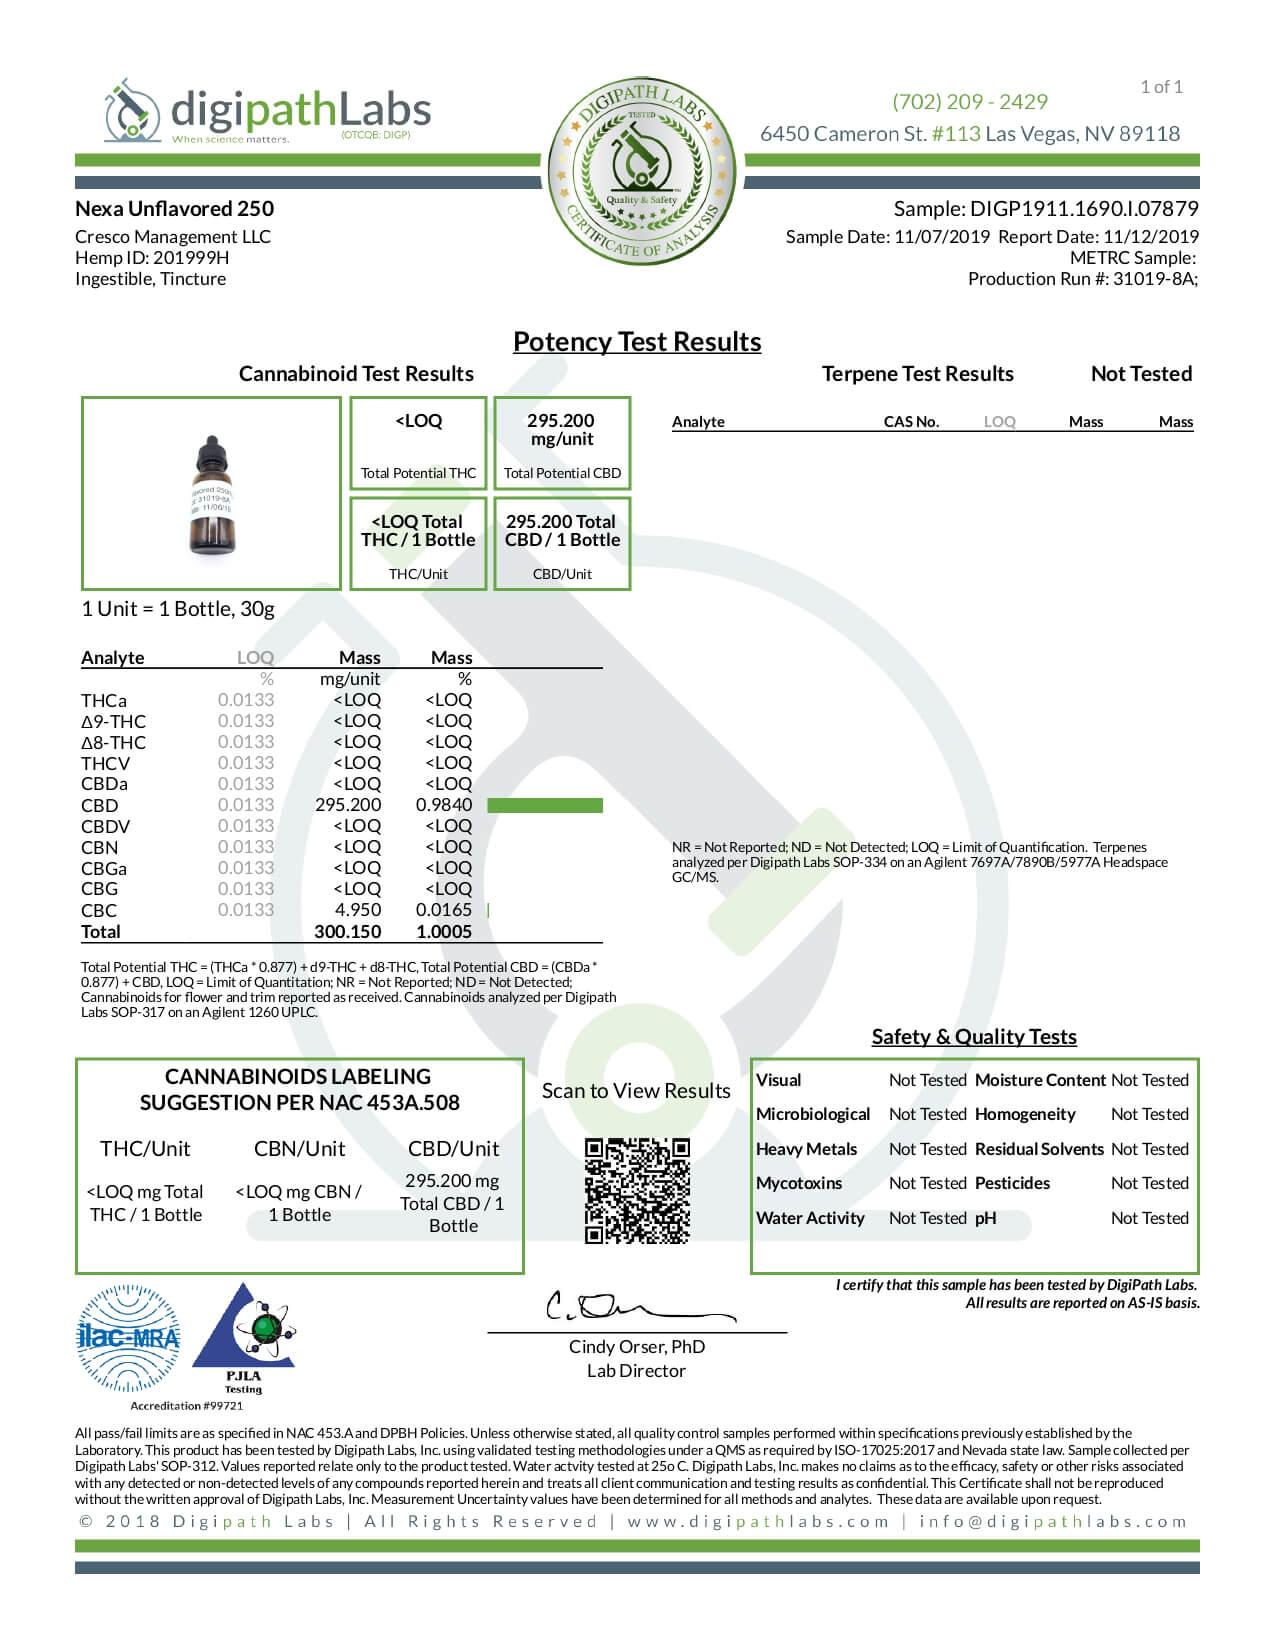 Nexa CBD Tincture Natural 250mg Lab Report